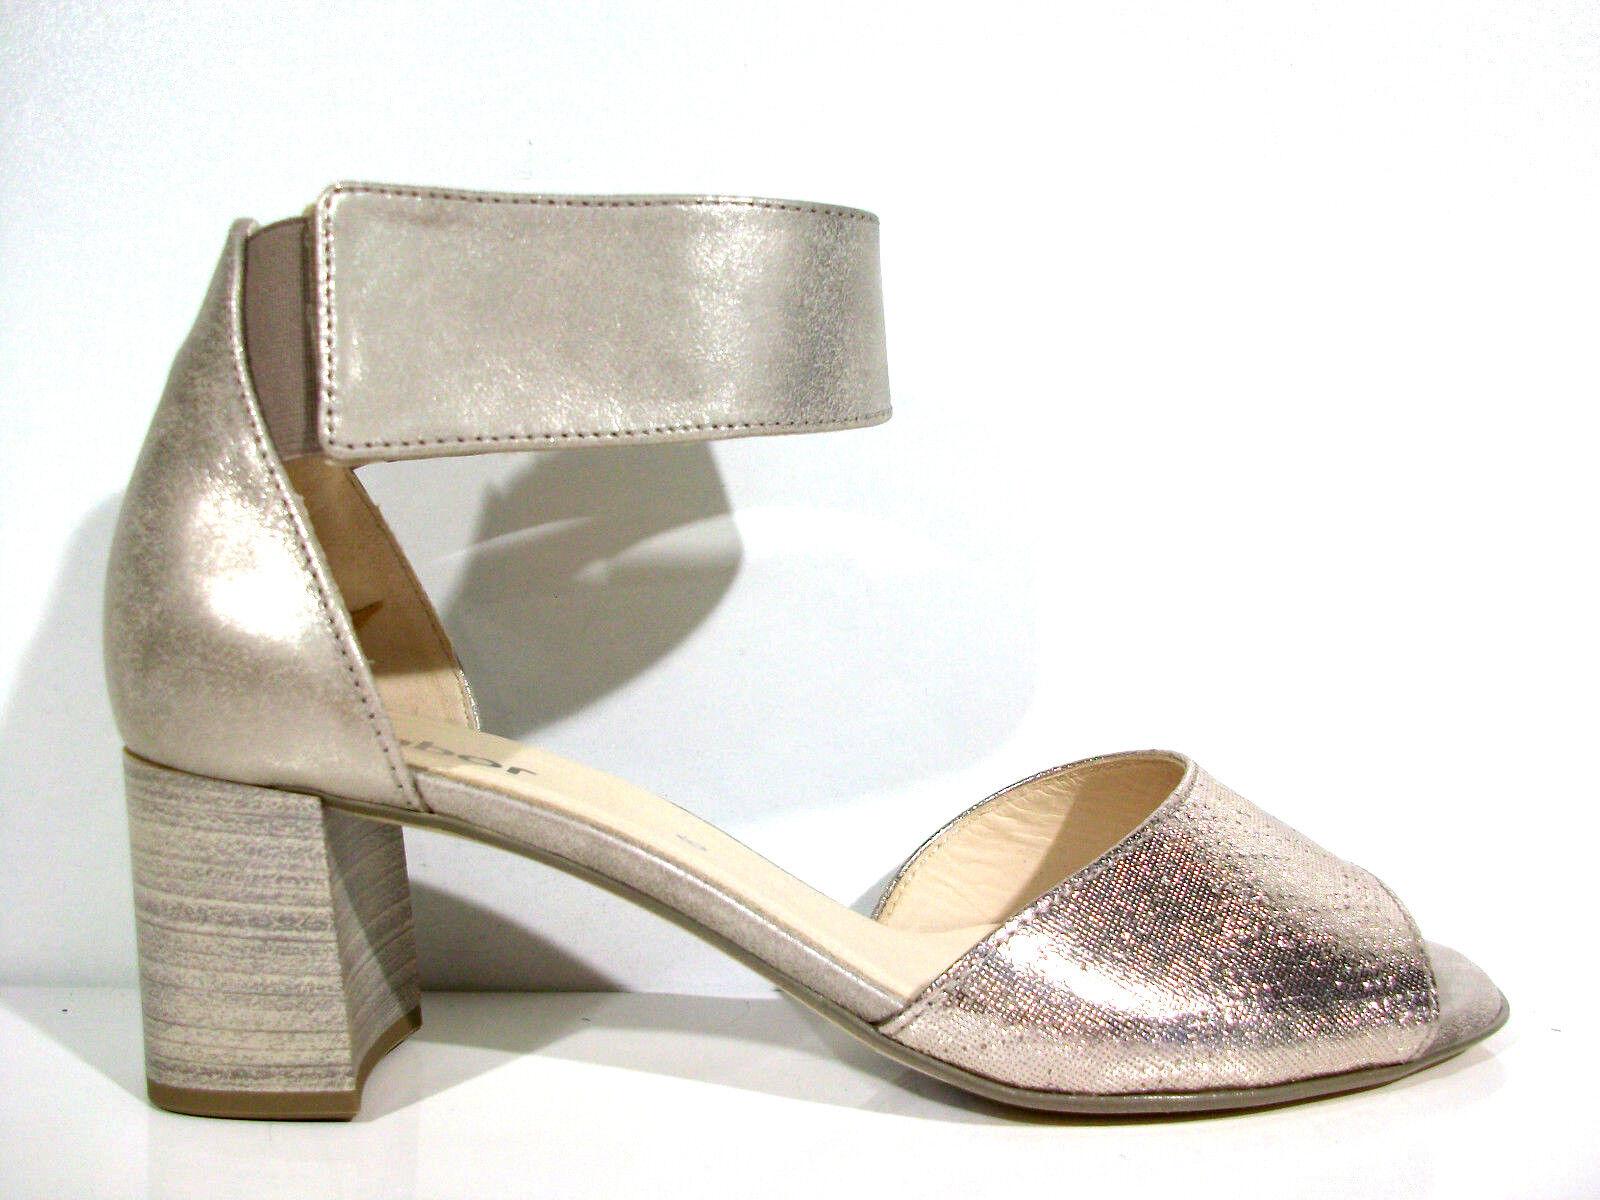 Gabor Sandale Sandalette 65.800.68 Farbe metallic  Größe 38-40 neu